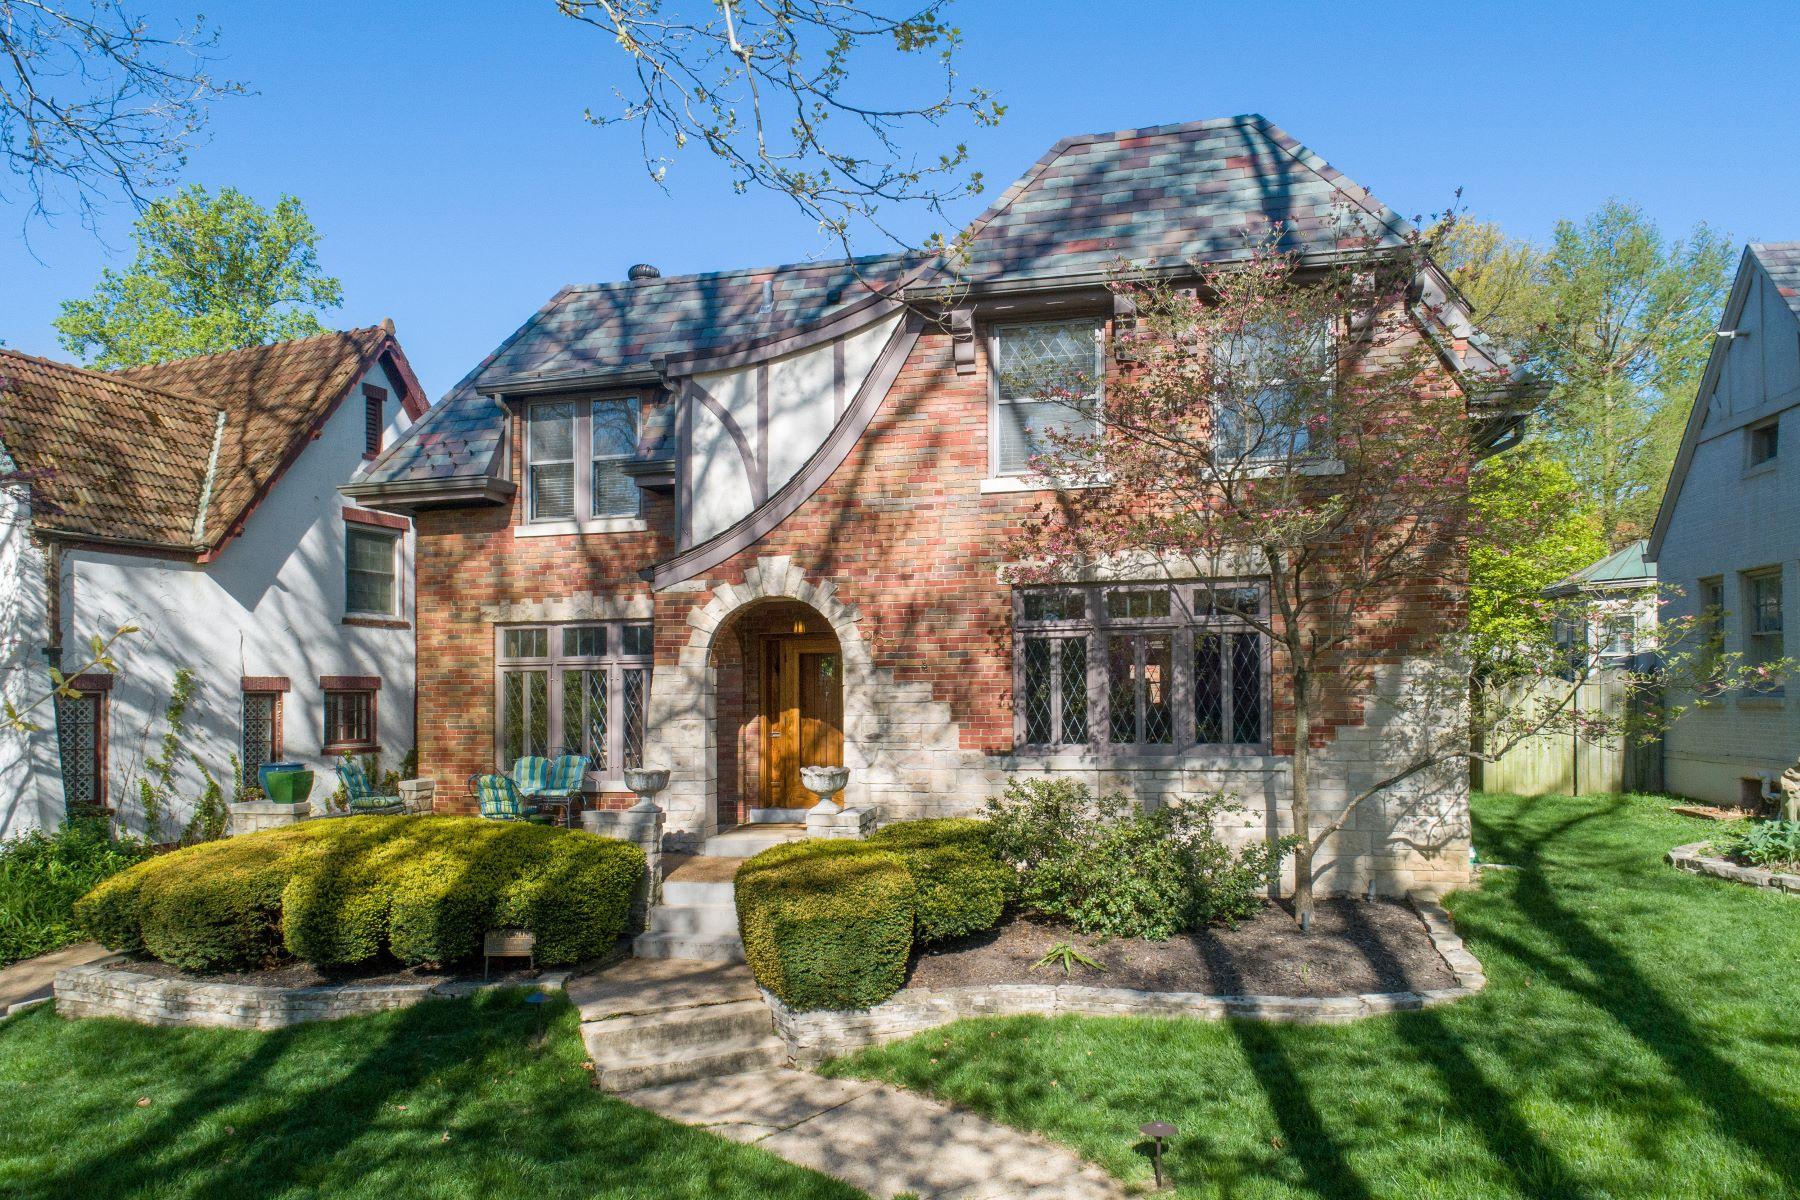 Additional photo for property listing at Charming University City Home! 567 Stratford Avenue University City, Missouri 63130 United States